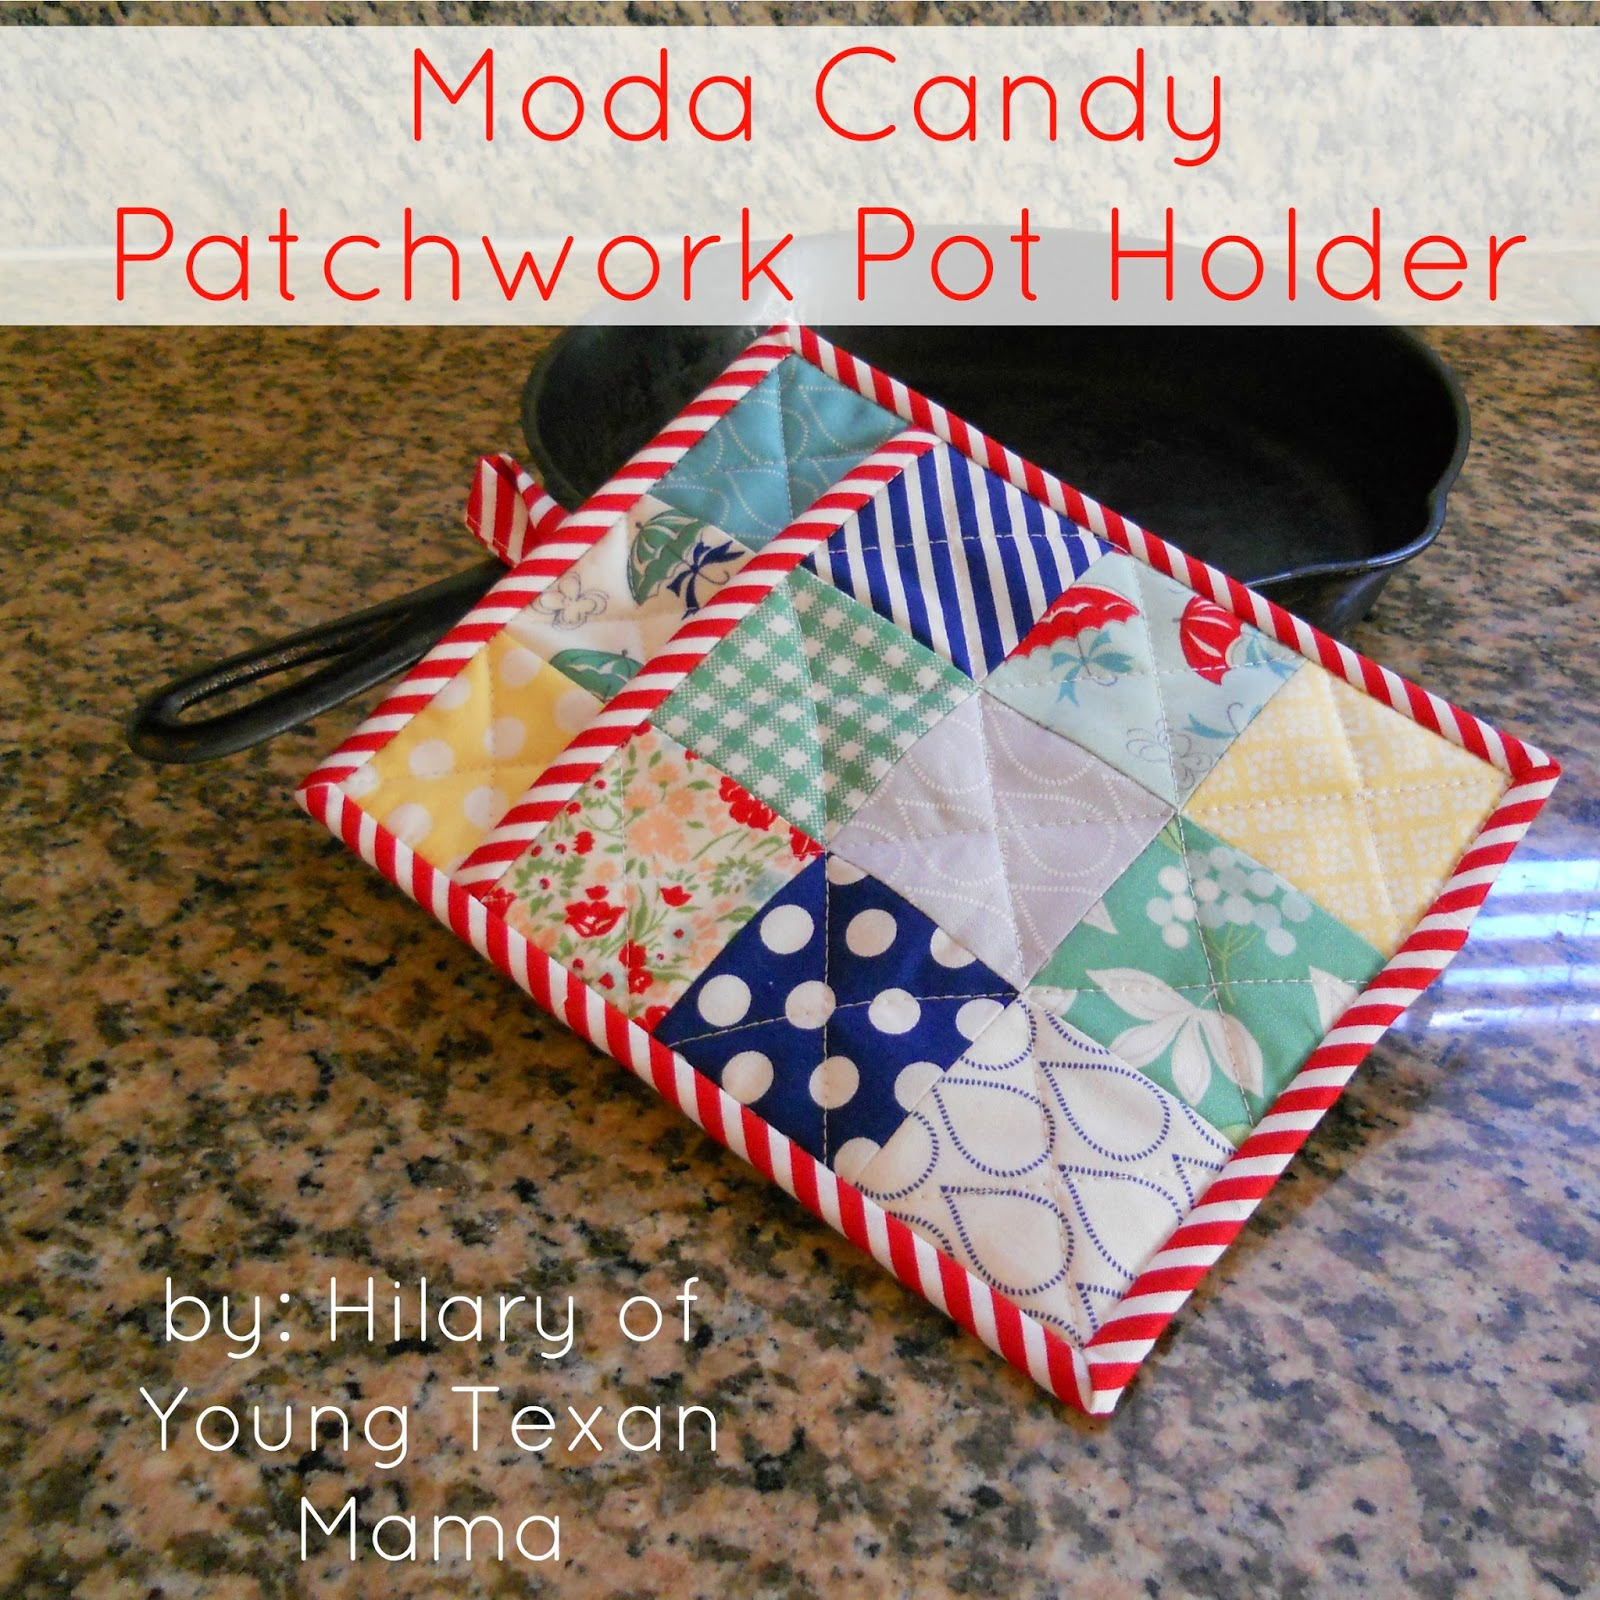 http://www.modabakeshop.com/2014/02/patchwork-pot-holder.html